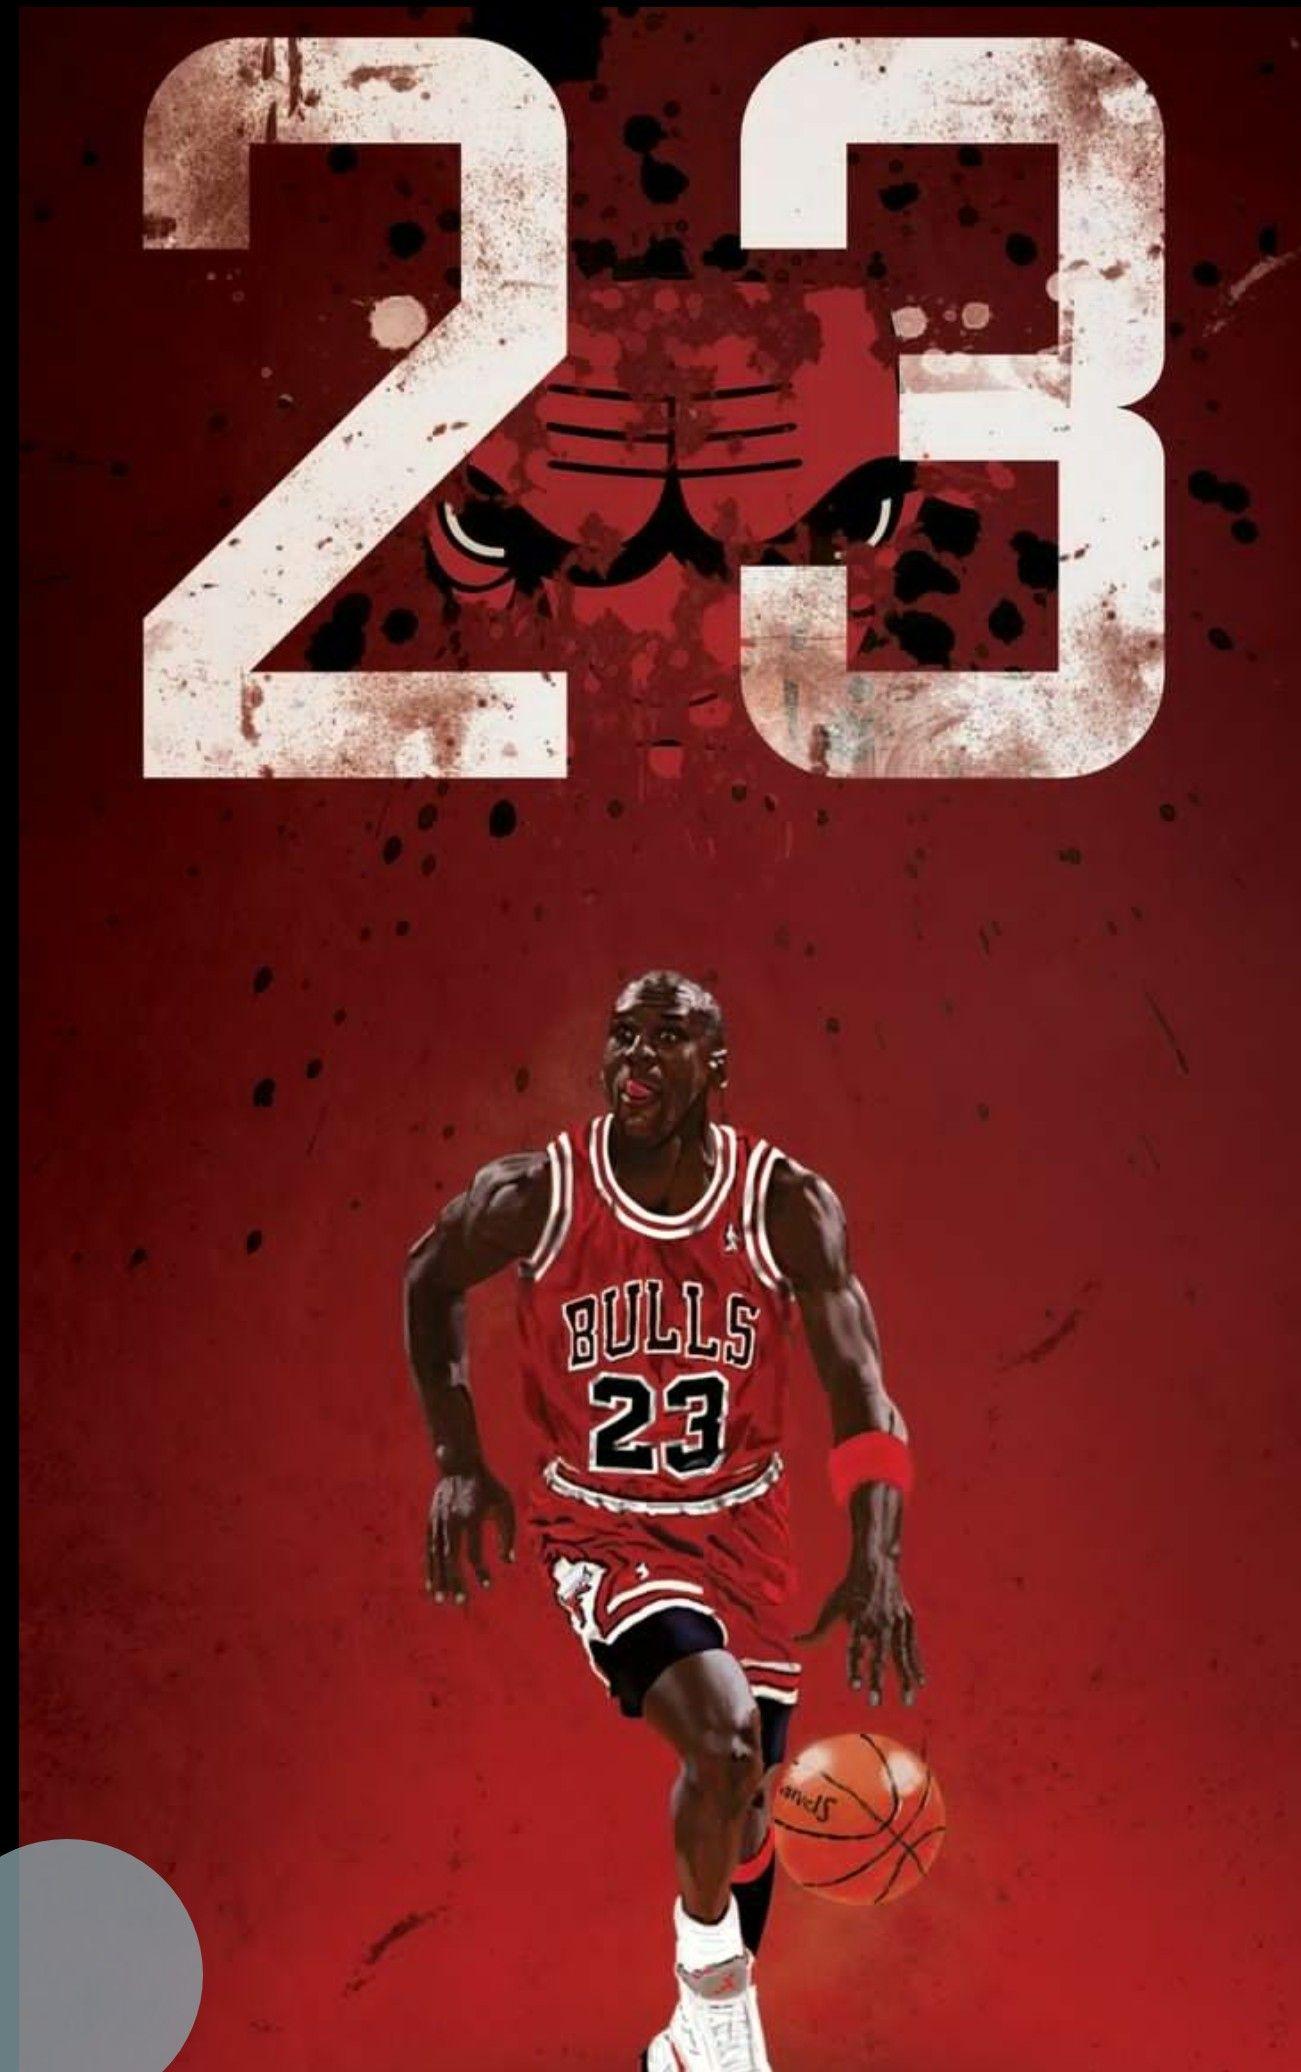 Michael Jordan Mickael Jordan Joueurs De Basketball Fond D écran Nba